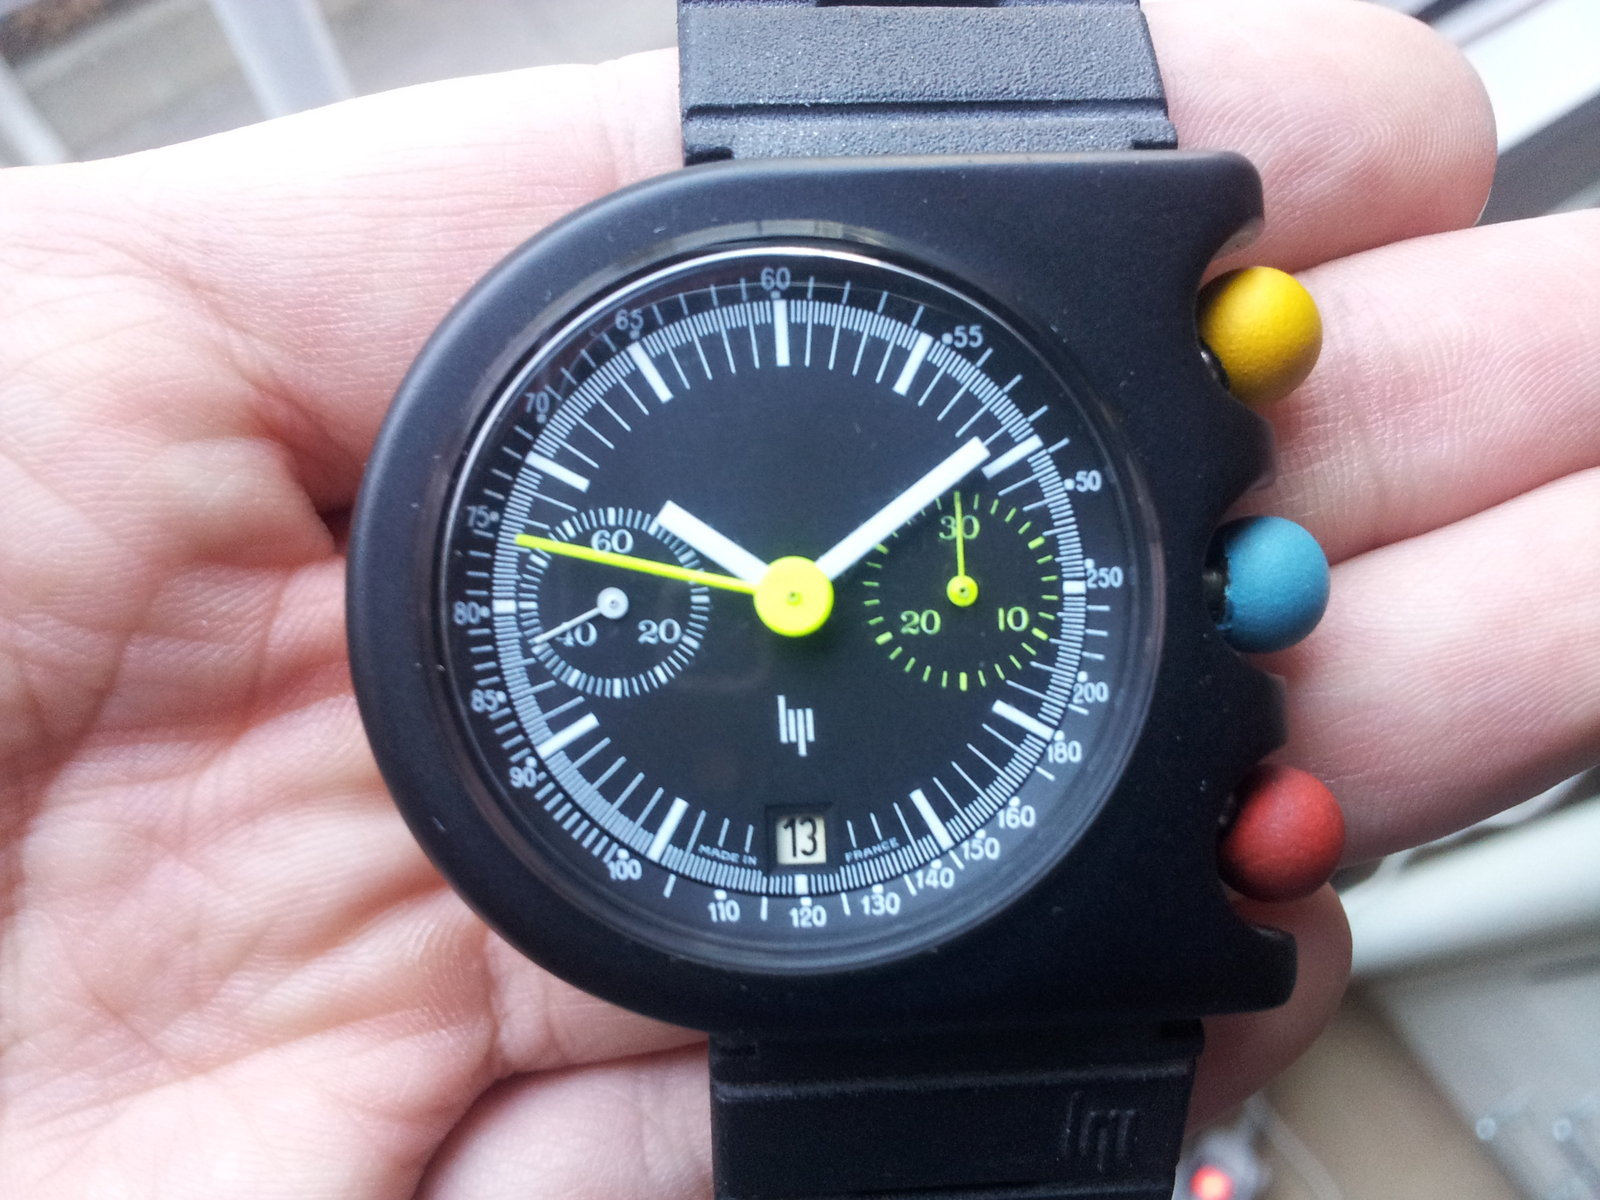 531362d1355738381t-original-lip-mach-2000-chronograph-armbanduhr-von-roger-tallon-1974-val-7734-20121217_101339.jpg